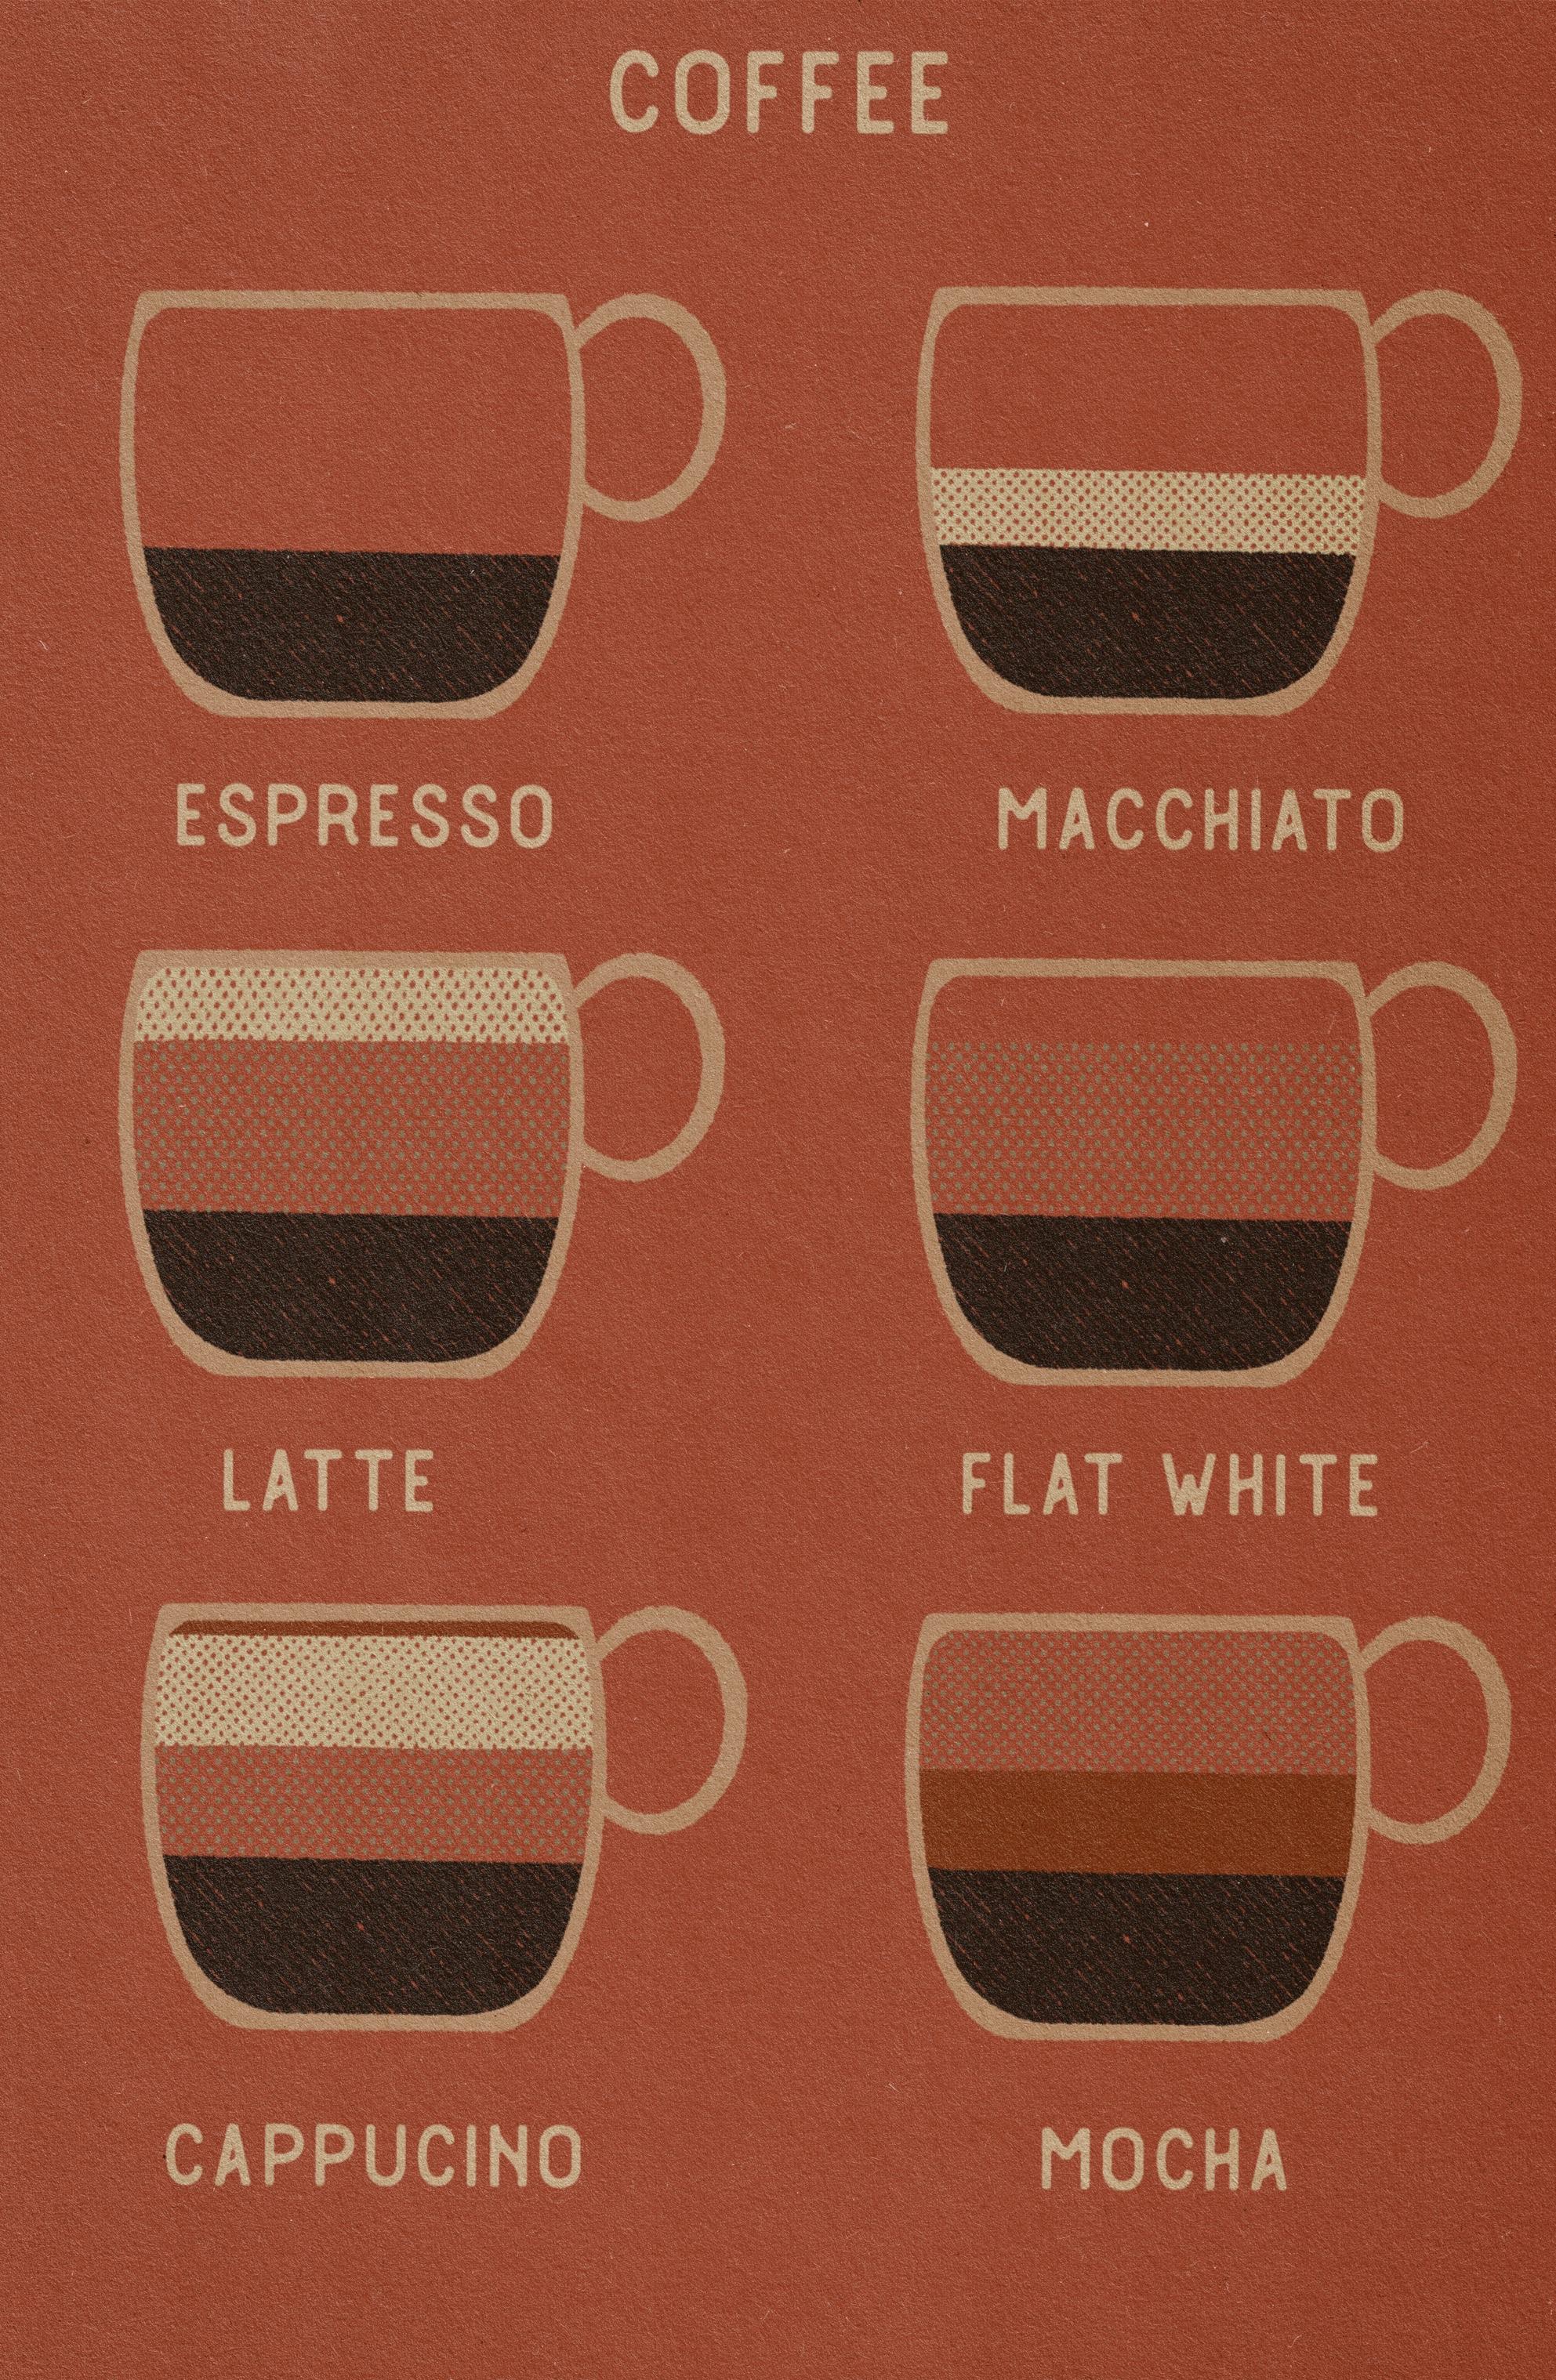 coffe chart texture .jpg